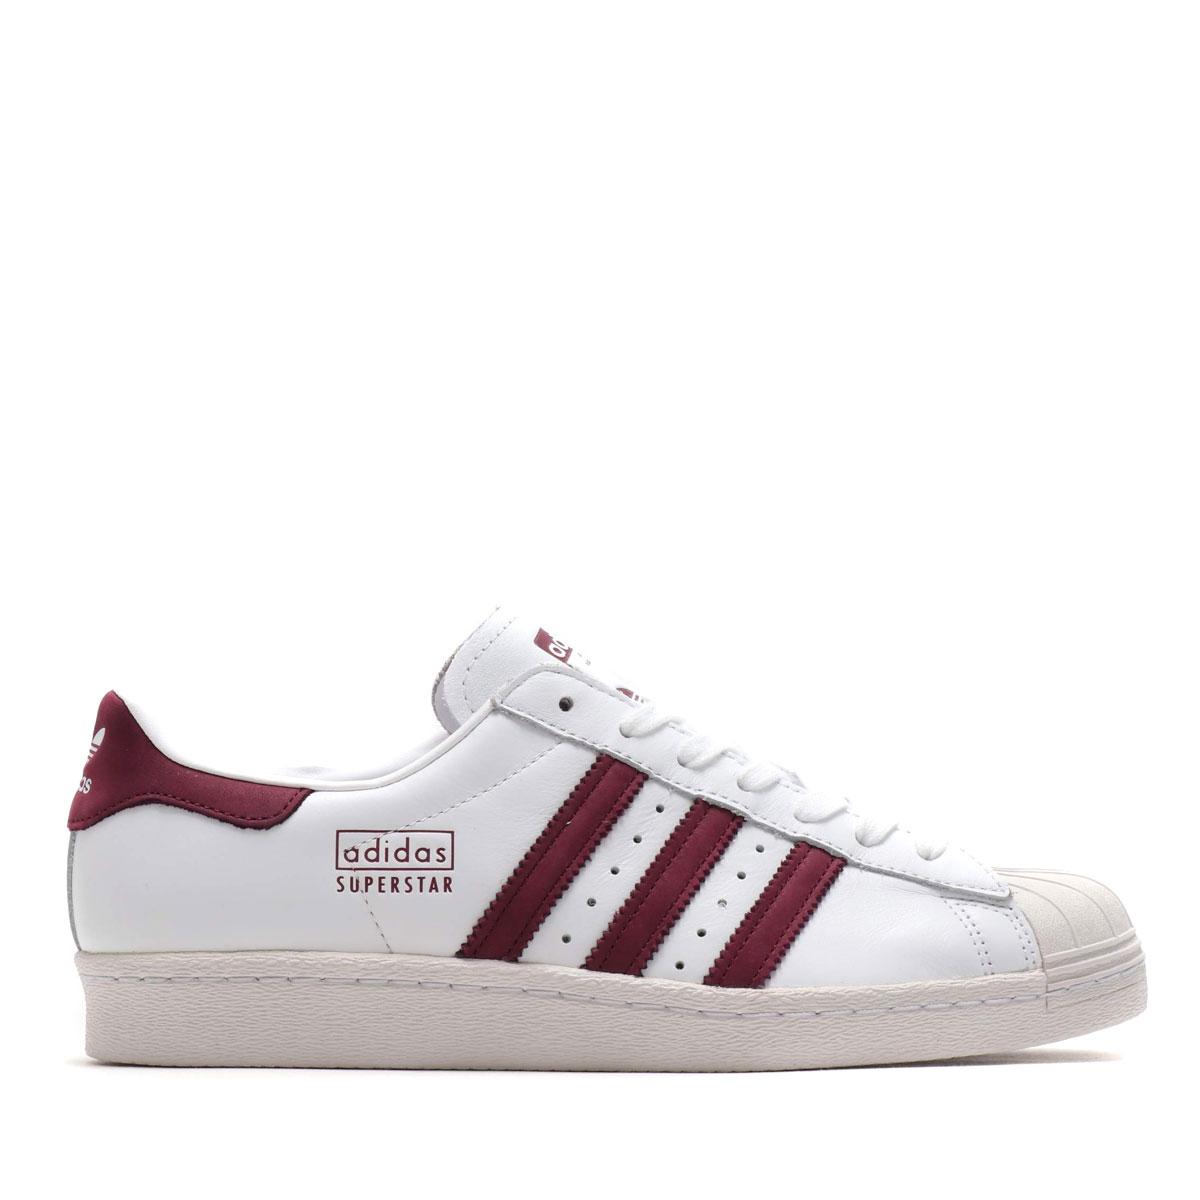 best sneakers 7f4f9 9ad67 adidas Originals SUPERSTAR 80s (RUNNING WHITE MAROON CRYSTAL WHITE) (Adidas  original ...